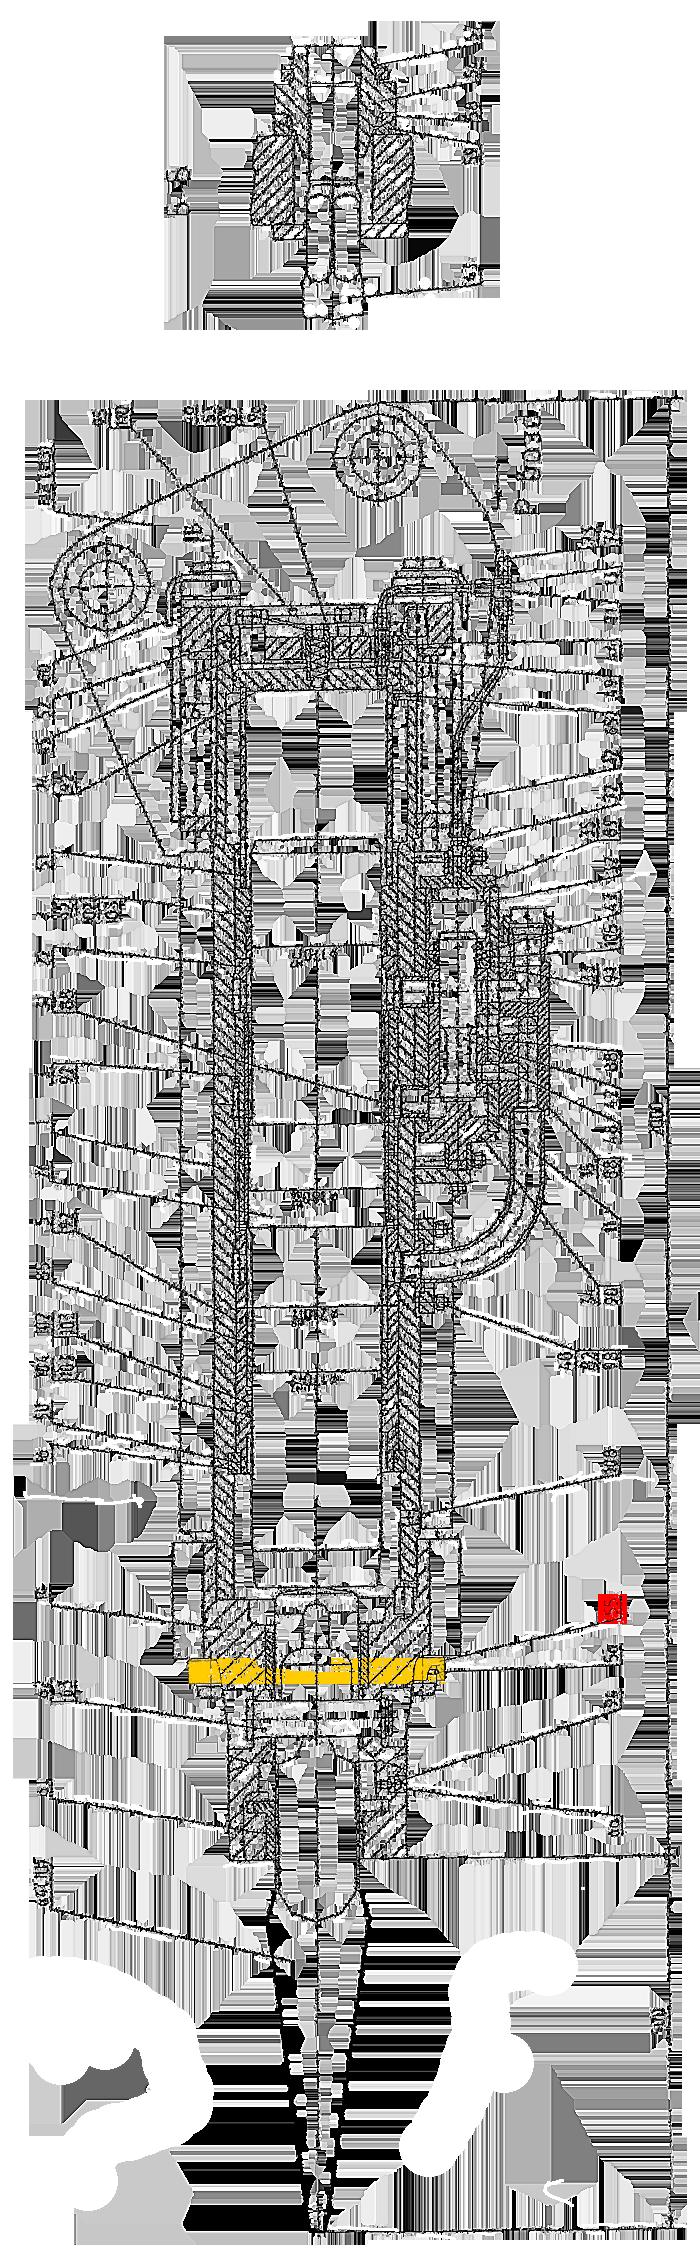 Втулка СП-71А.022.1.065 гидромолота МГ-300